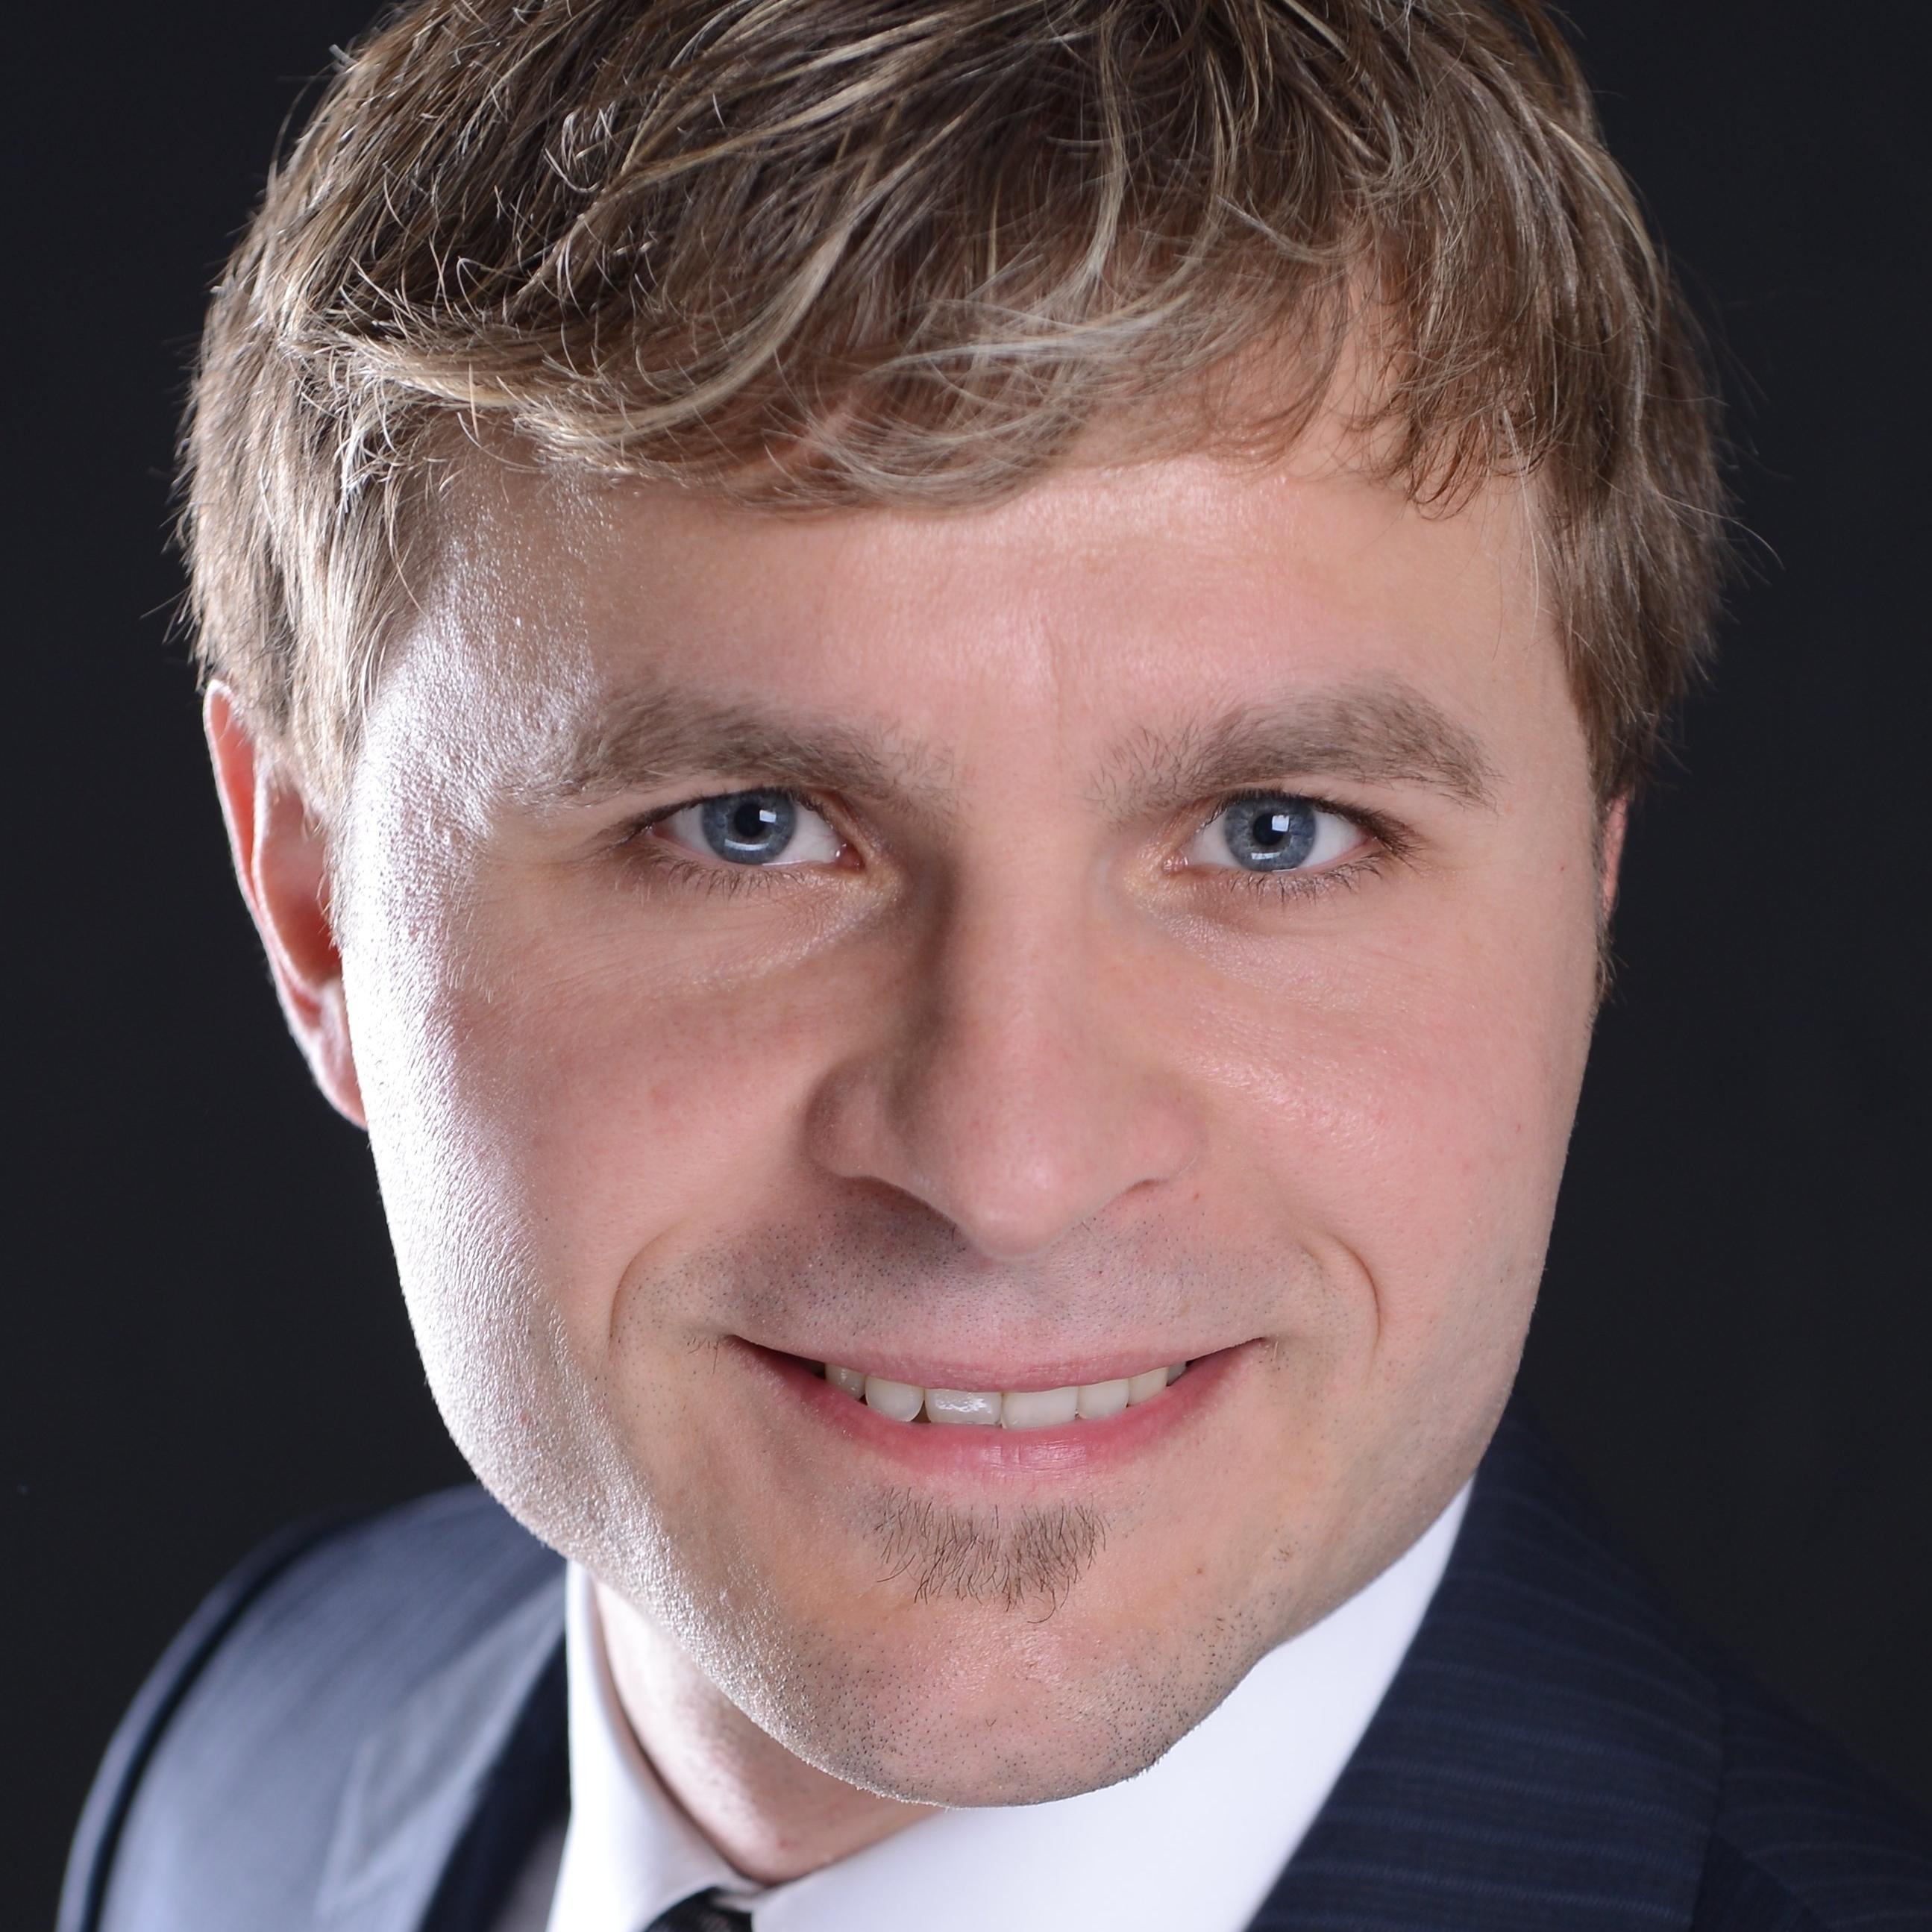 Dr. Mark Bennemann